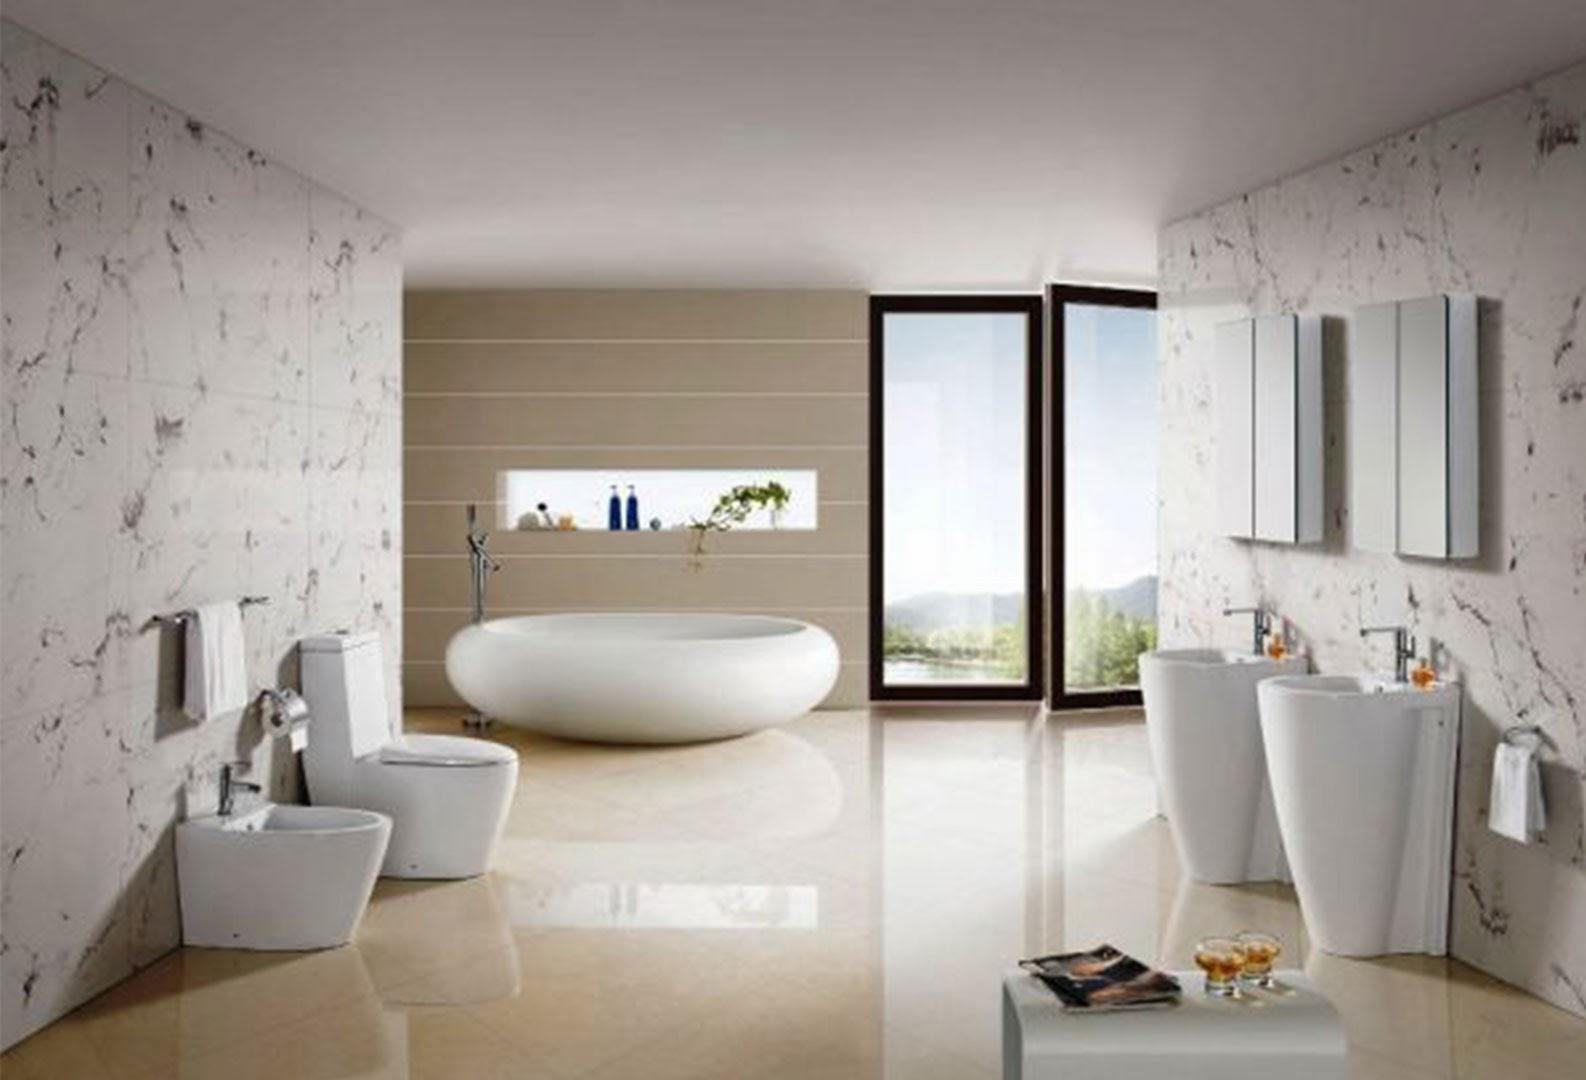 bathroom. New Cool Small Bathroom Decor Ideas Home Design Planning Beautiful